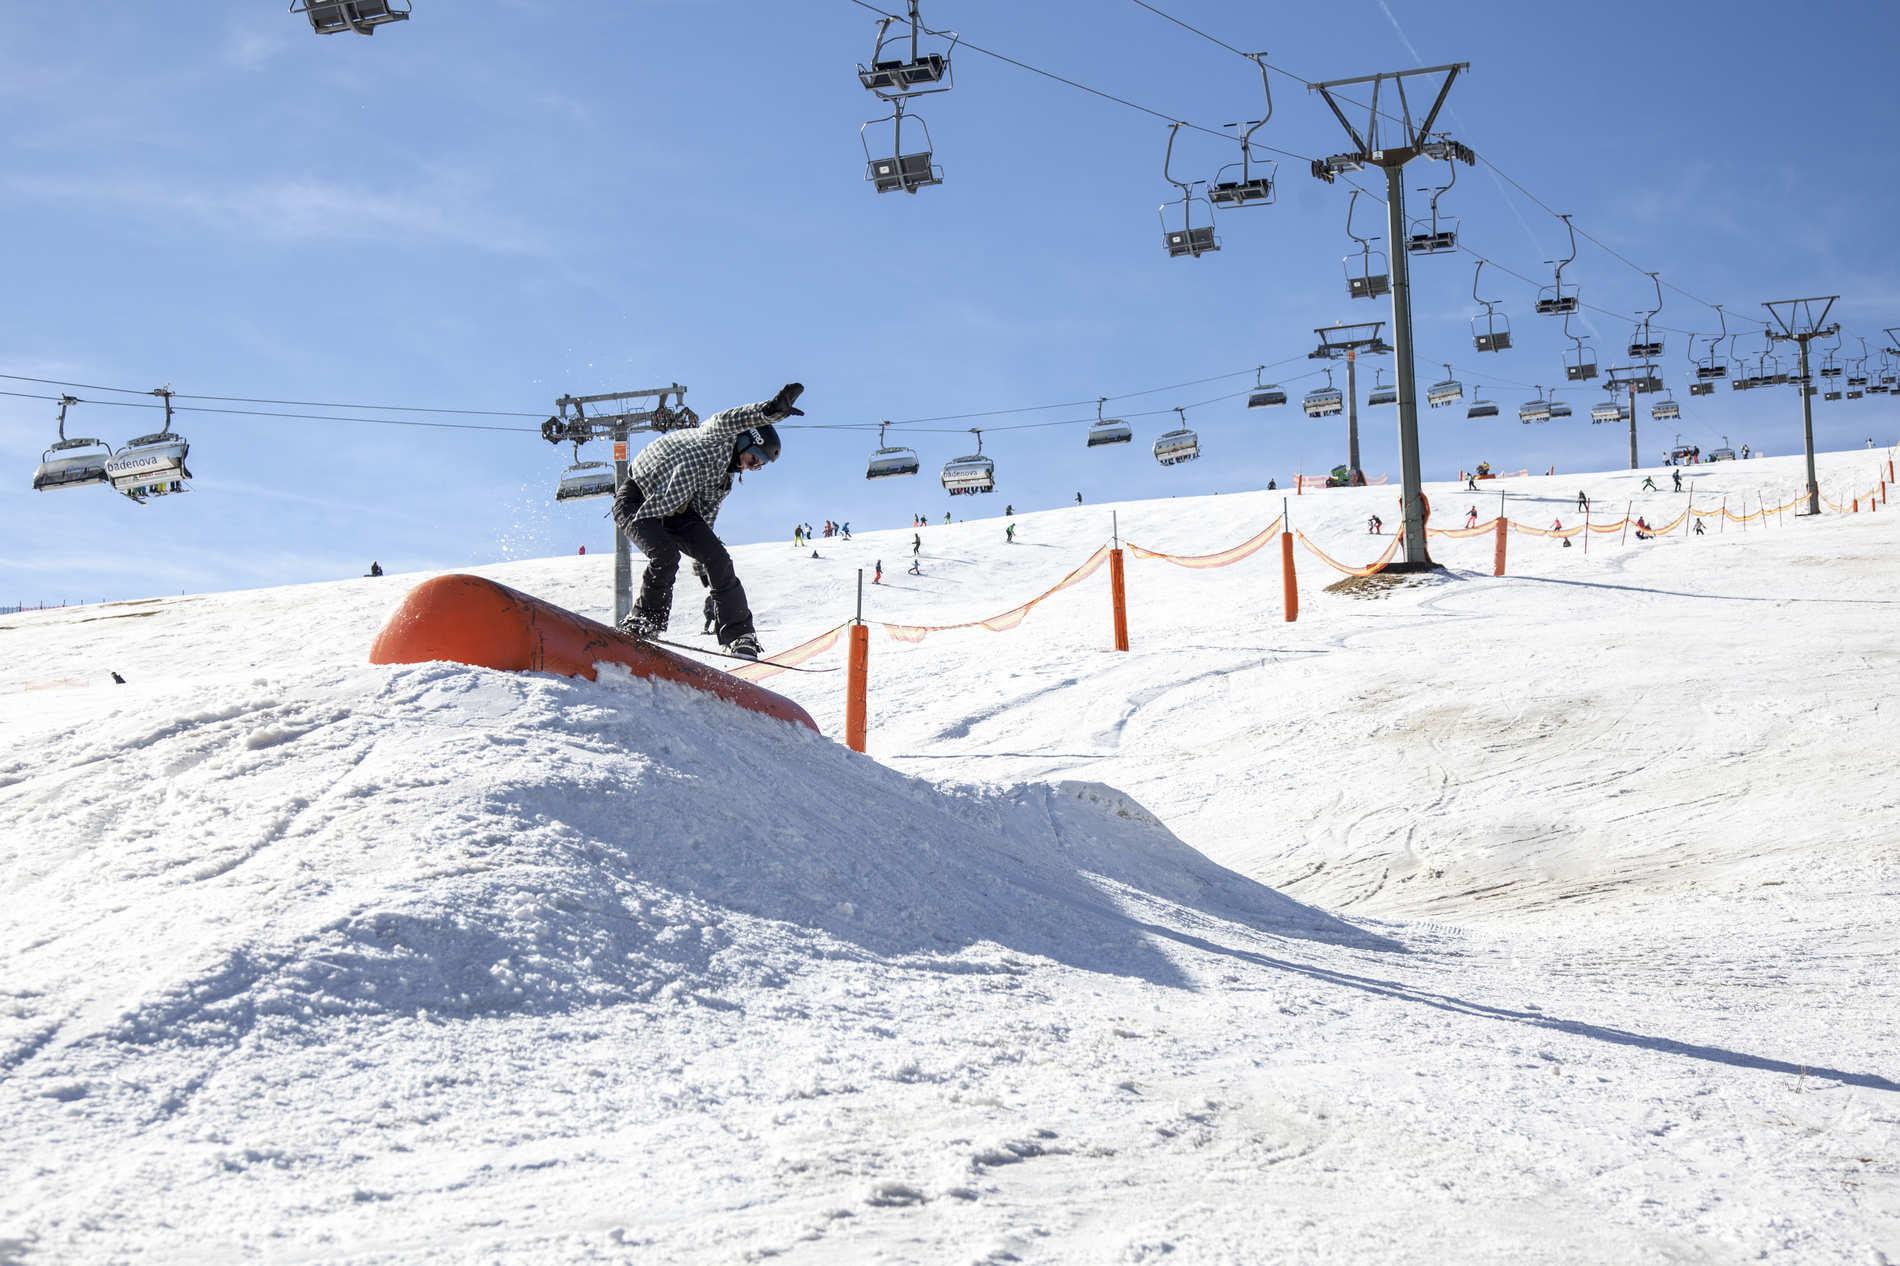 web snowpark feldberg 25 02 2017 action sb annika bartmann martin herrmann qparks 7